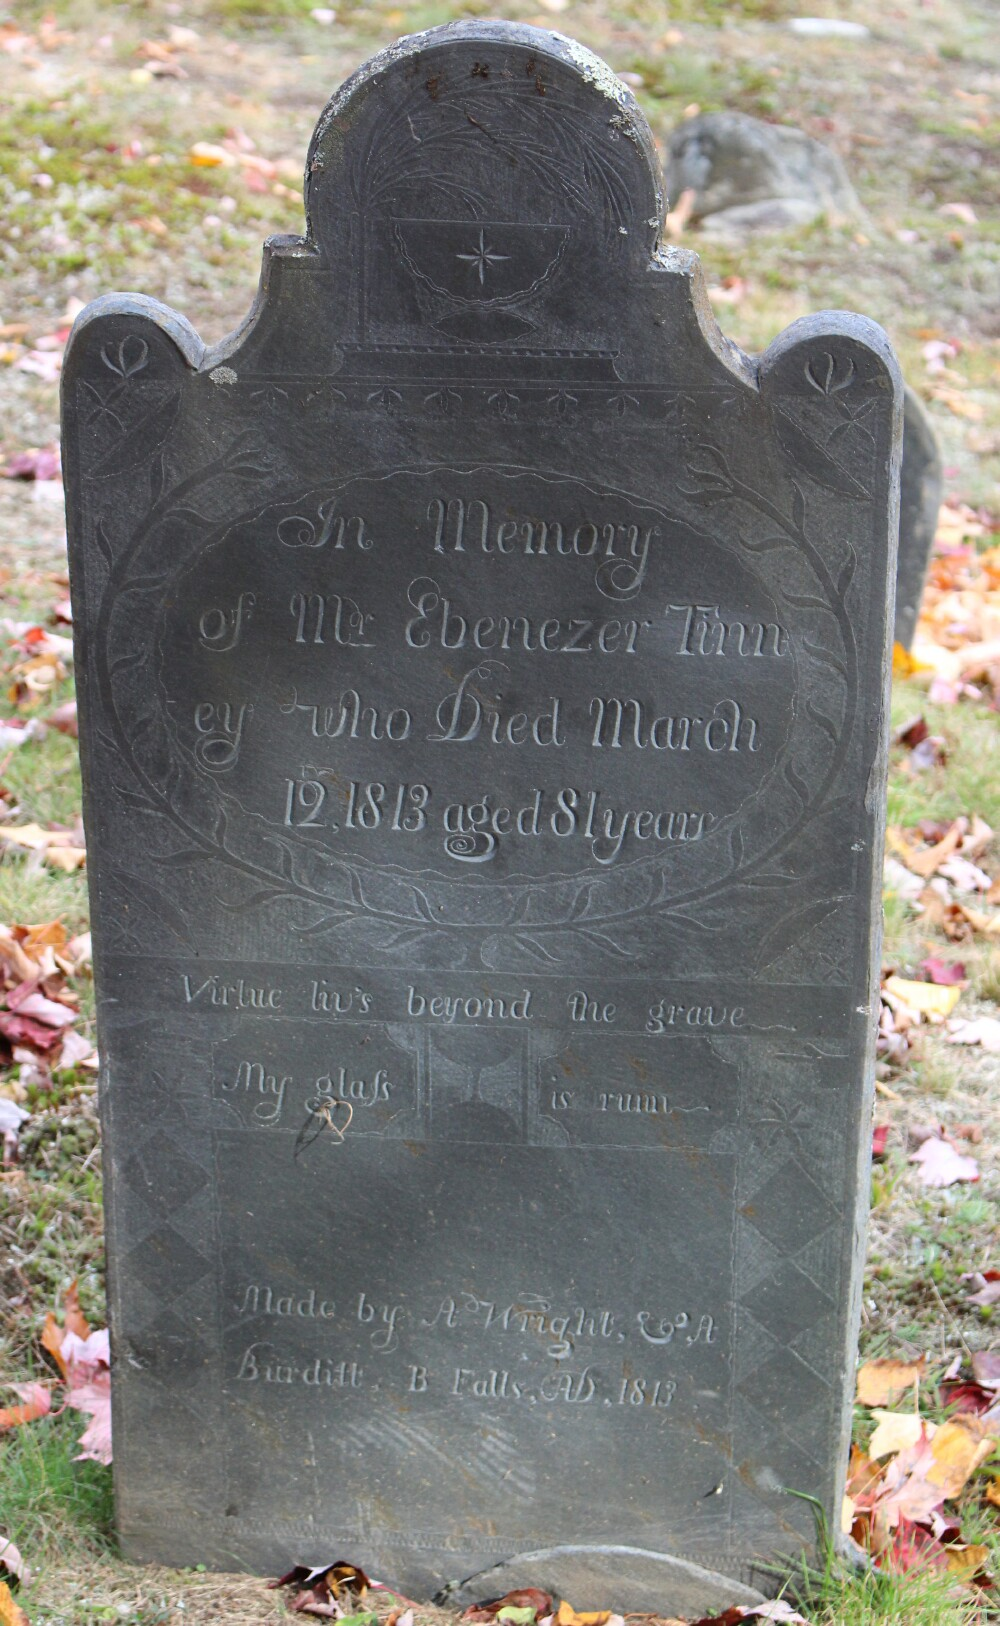 Ebenezer Tinney's tombstone in Grafton, Vermont (Courtesy of James Bianco)